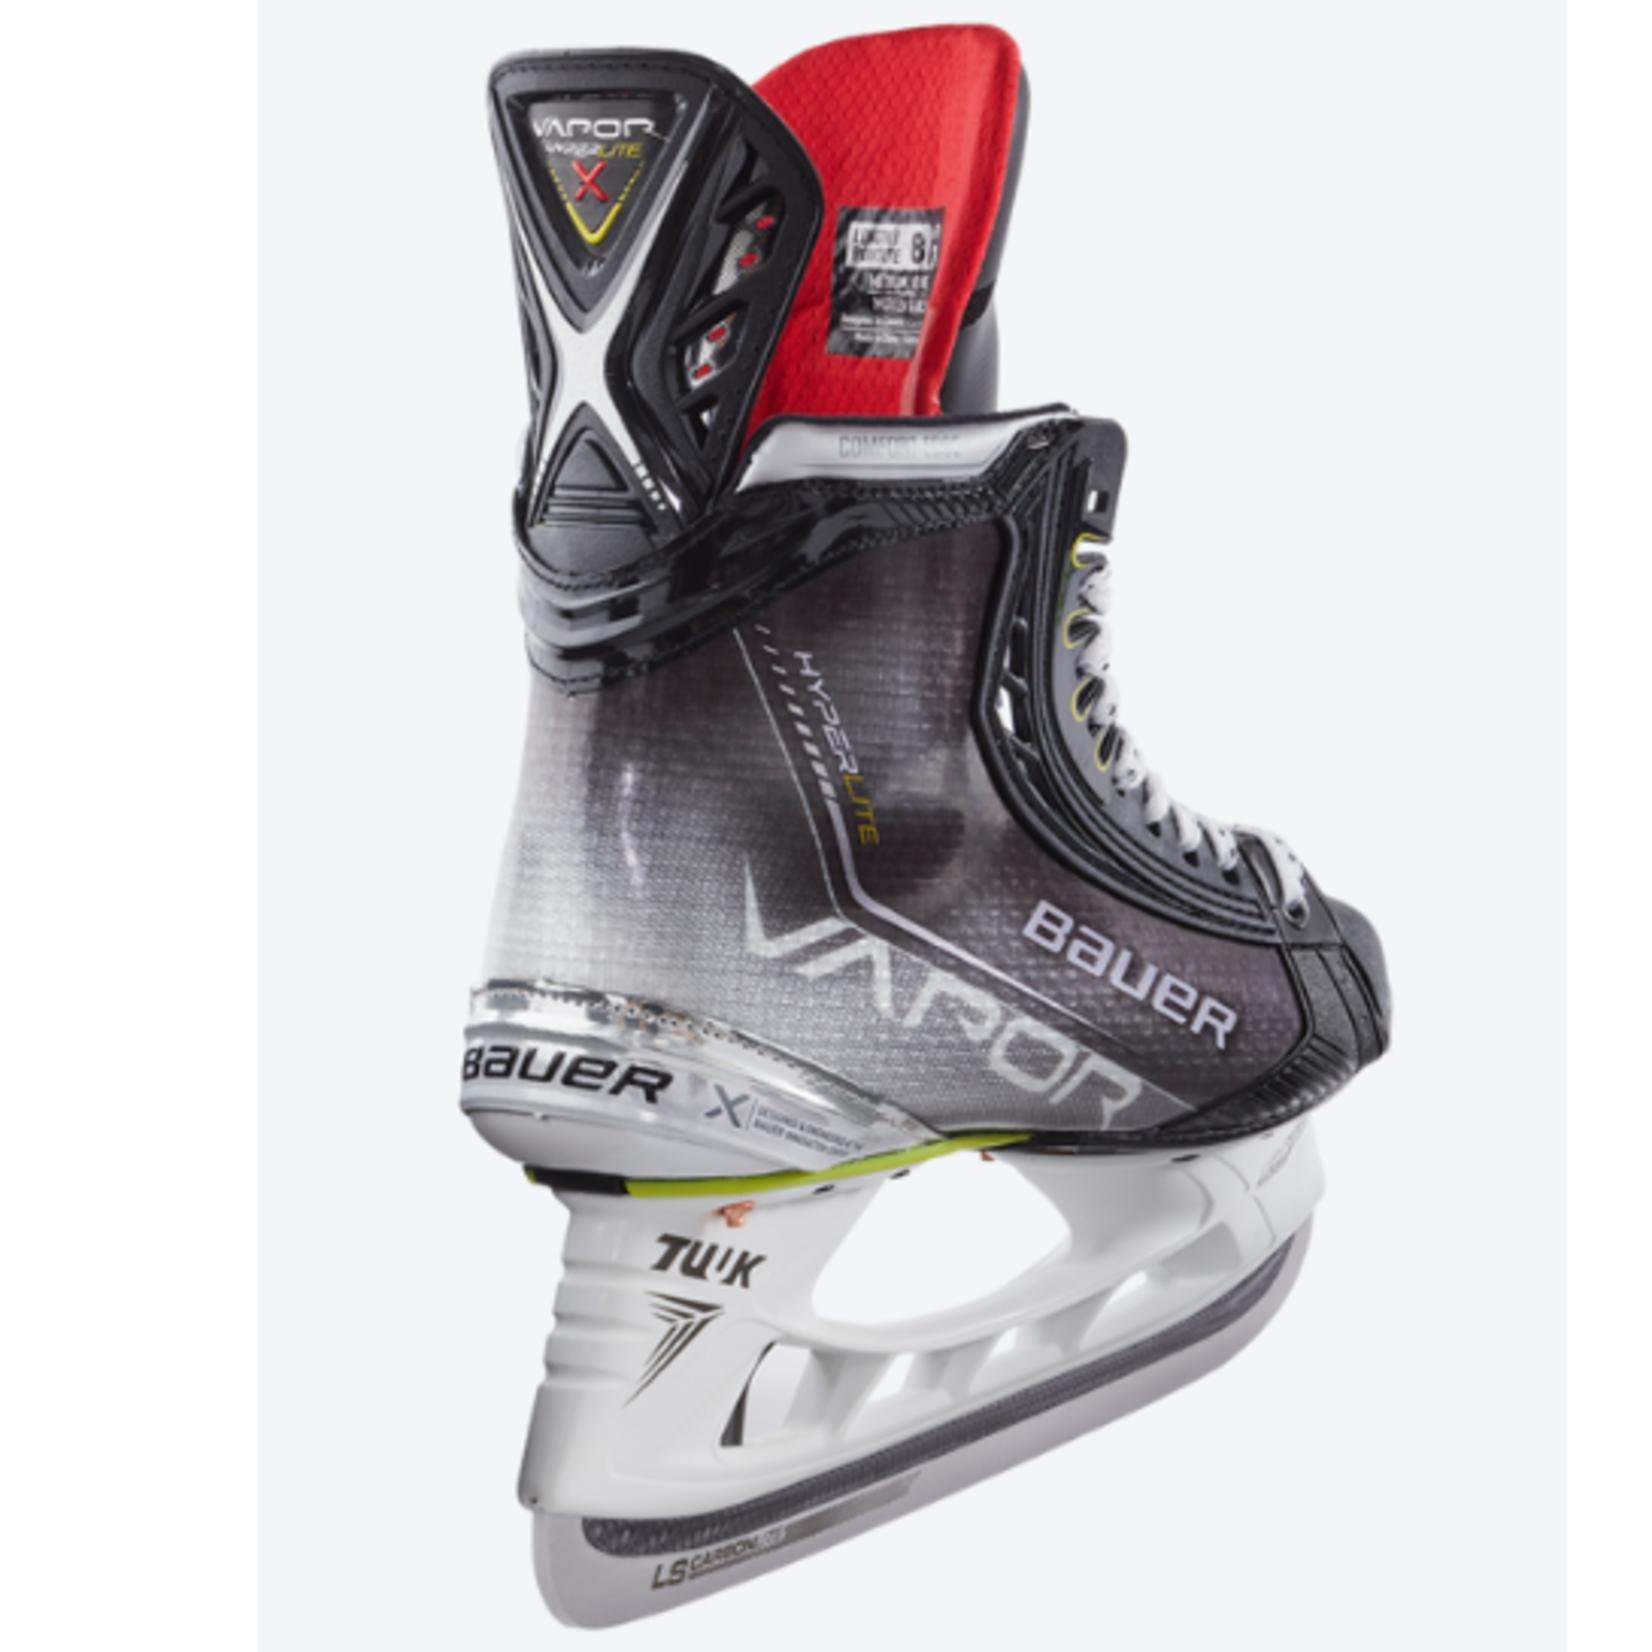 S21 BAUER  Vapor Hyperlite Skates IN